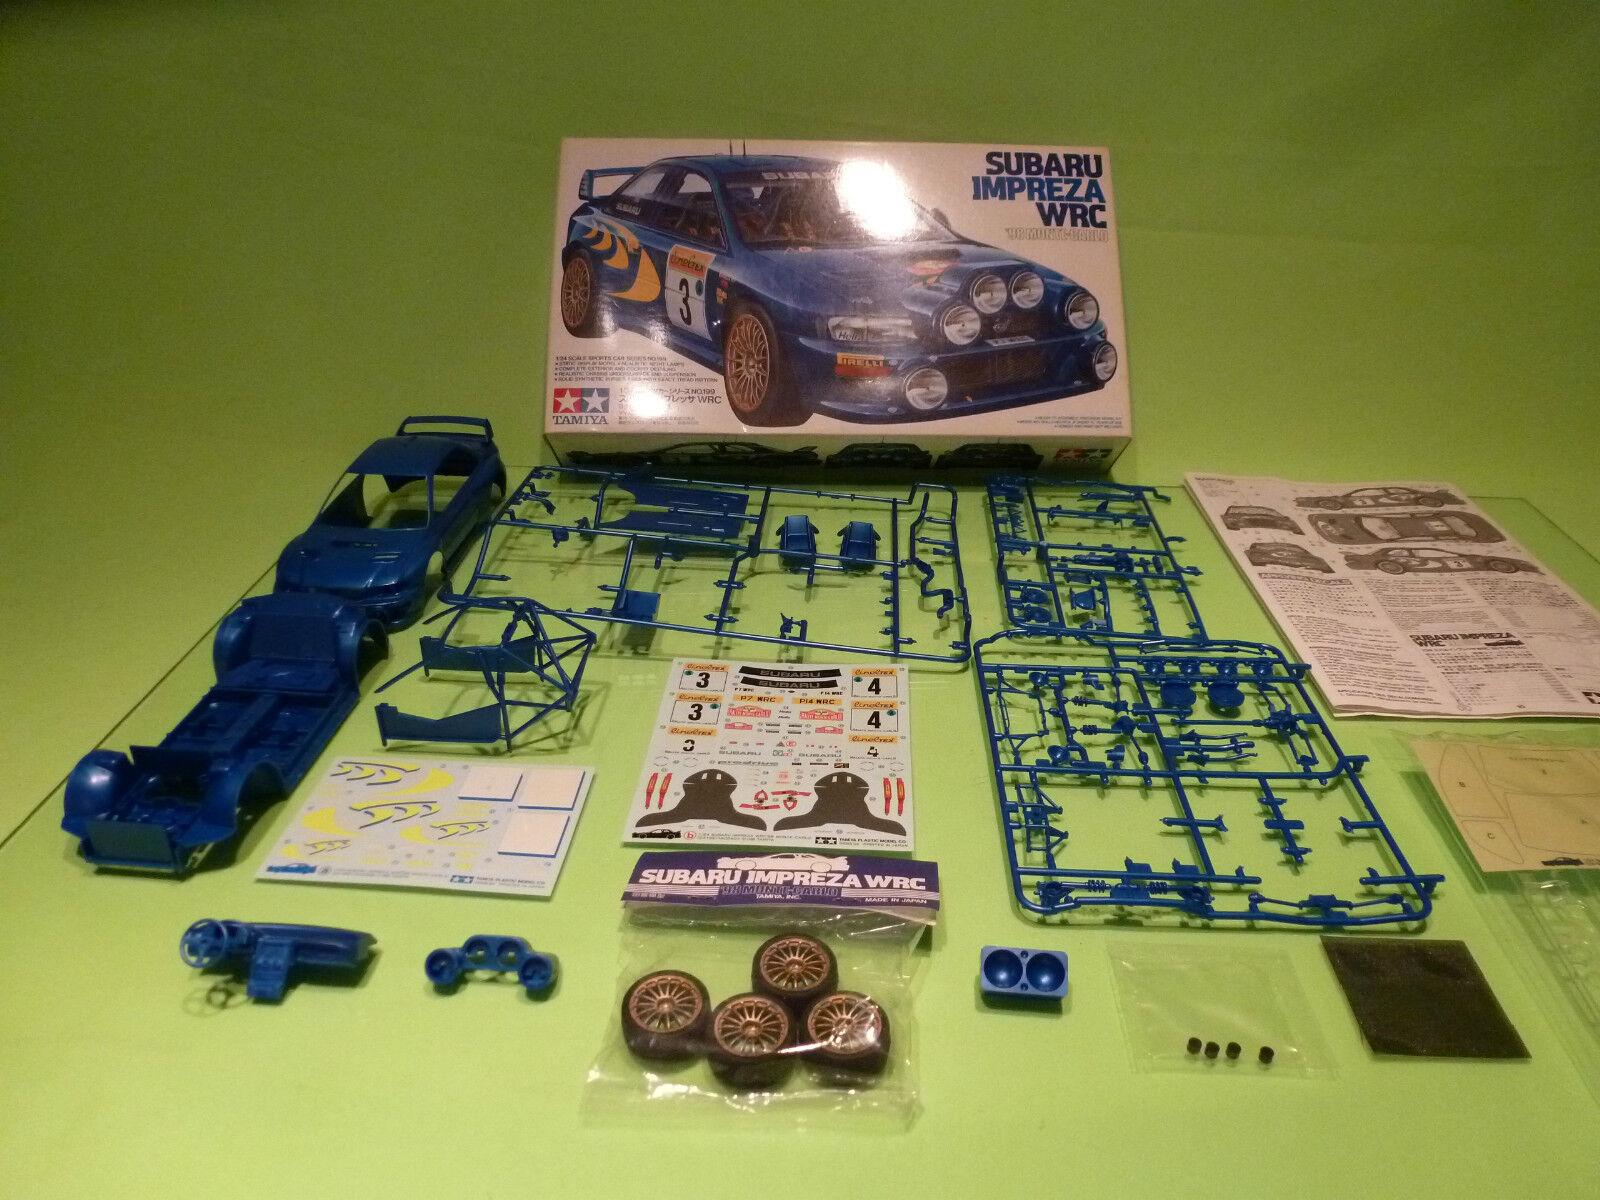 TAMIYA KIT 24199 SUBARU IMPREZA WRC MONTE CARLO 1998 - 1 24 - VG IN BOX